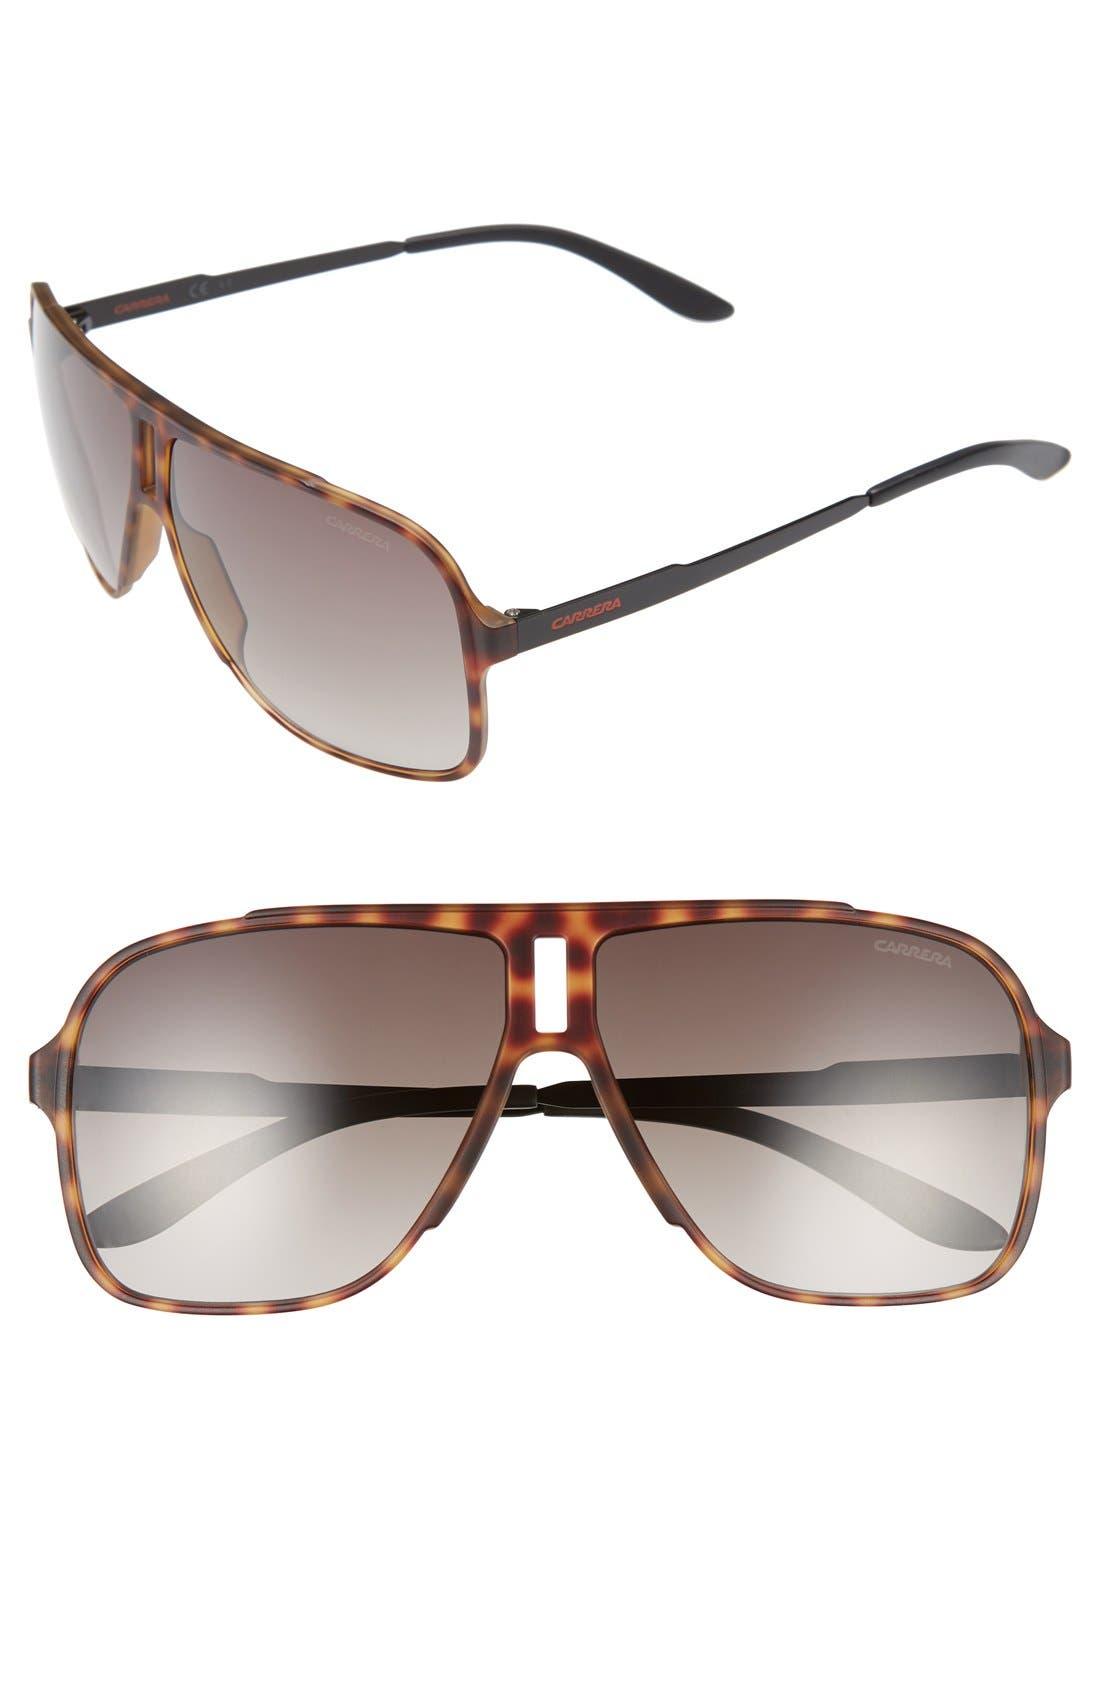 61mm Sunglasses,                         Main,                         color, 210